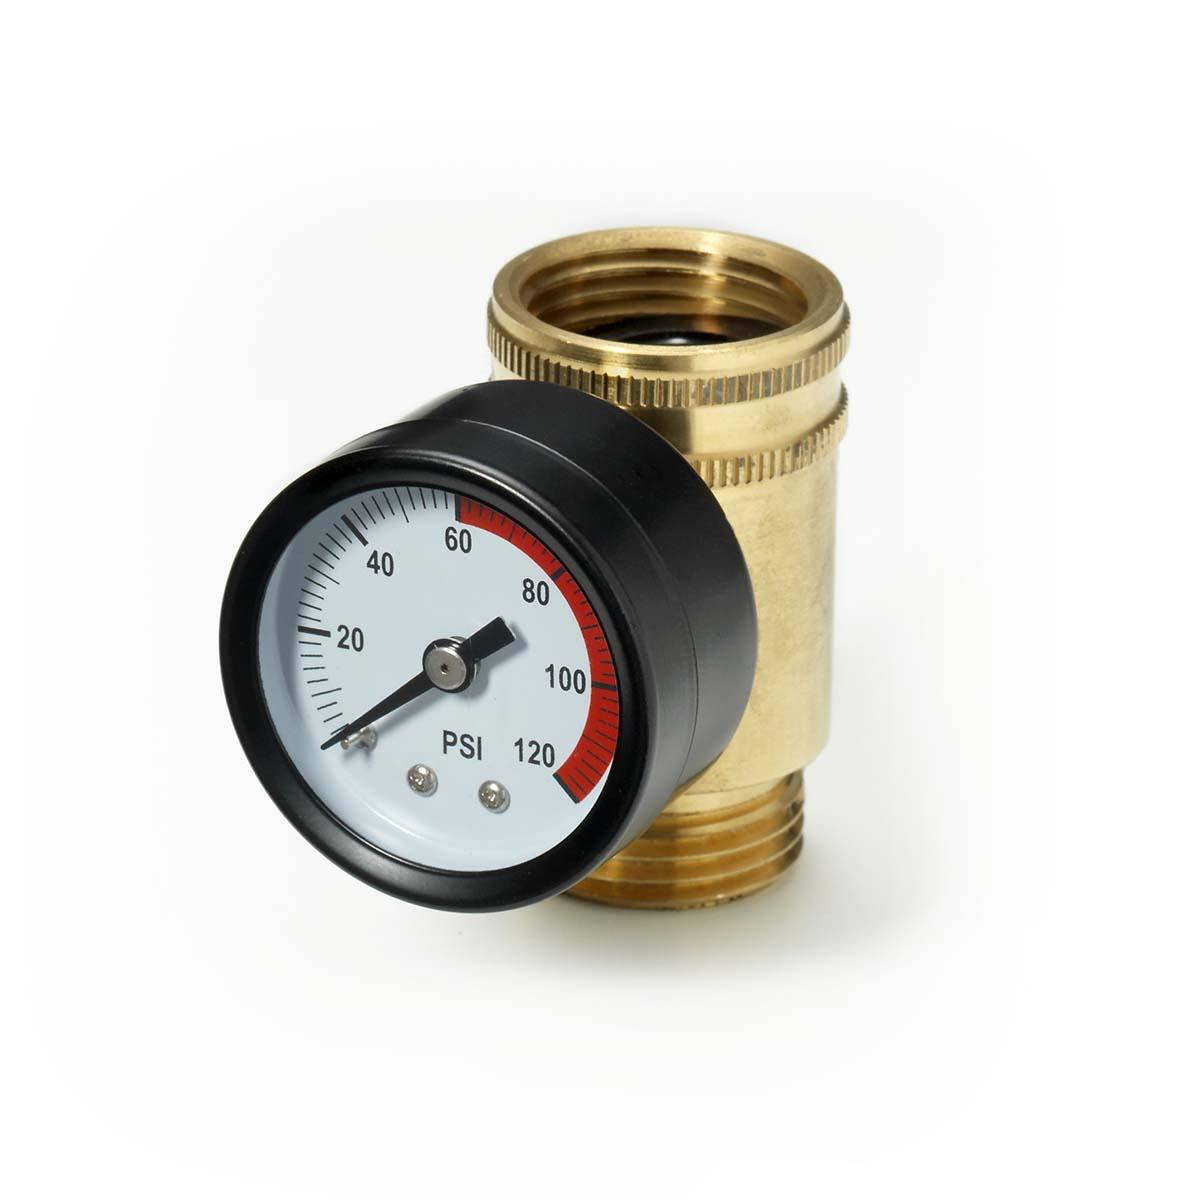 AIRMKT eCom Pressure Guage_85843